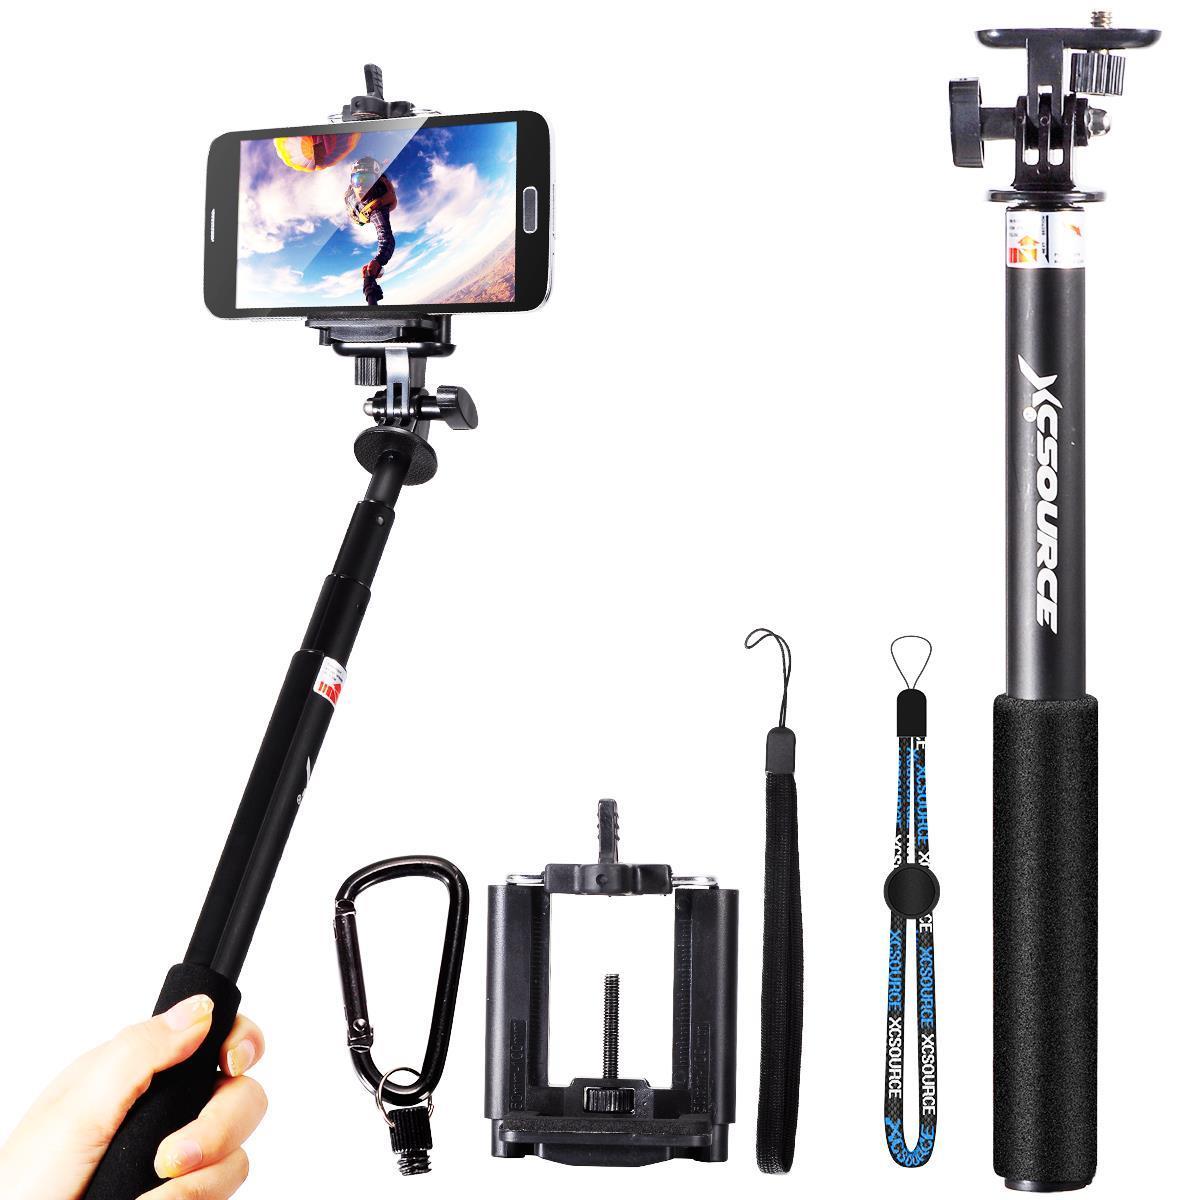 Xcsource Self Portrait Monopod Phone Stick Support Pole bluetooth stick extendable tripod for camera XC201(China (Mainland))